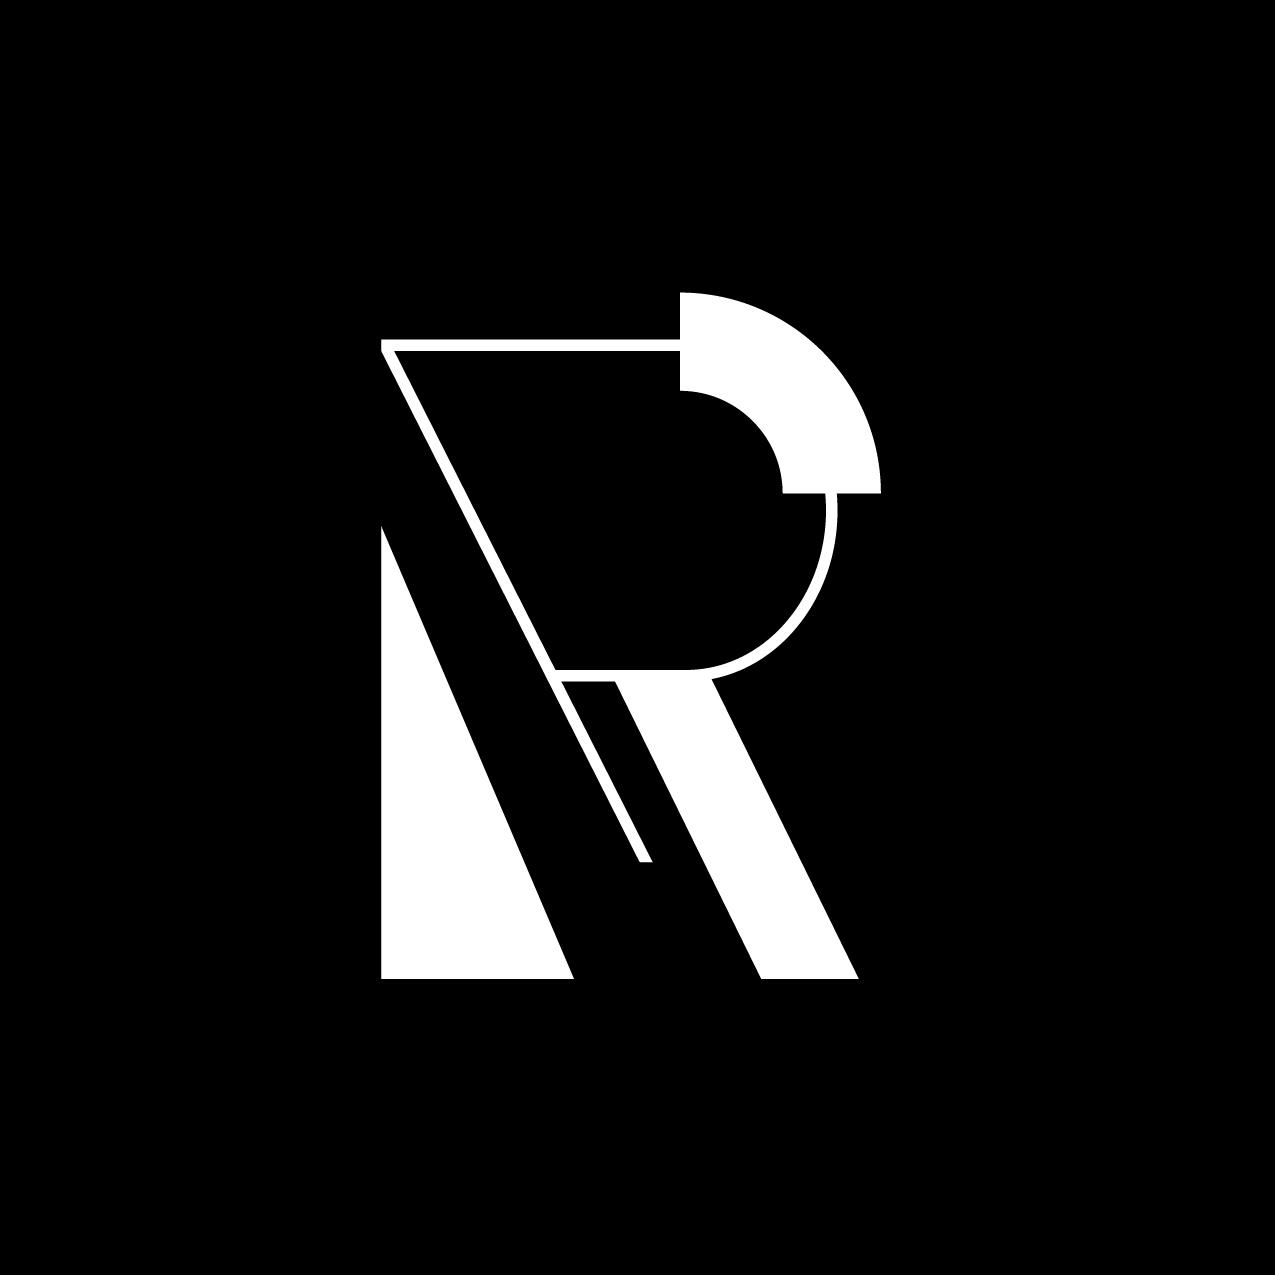 Letter R2 Design by Furia